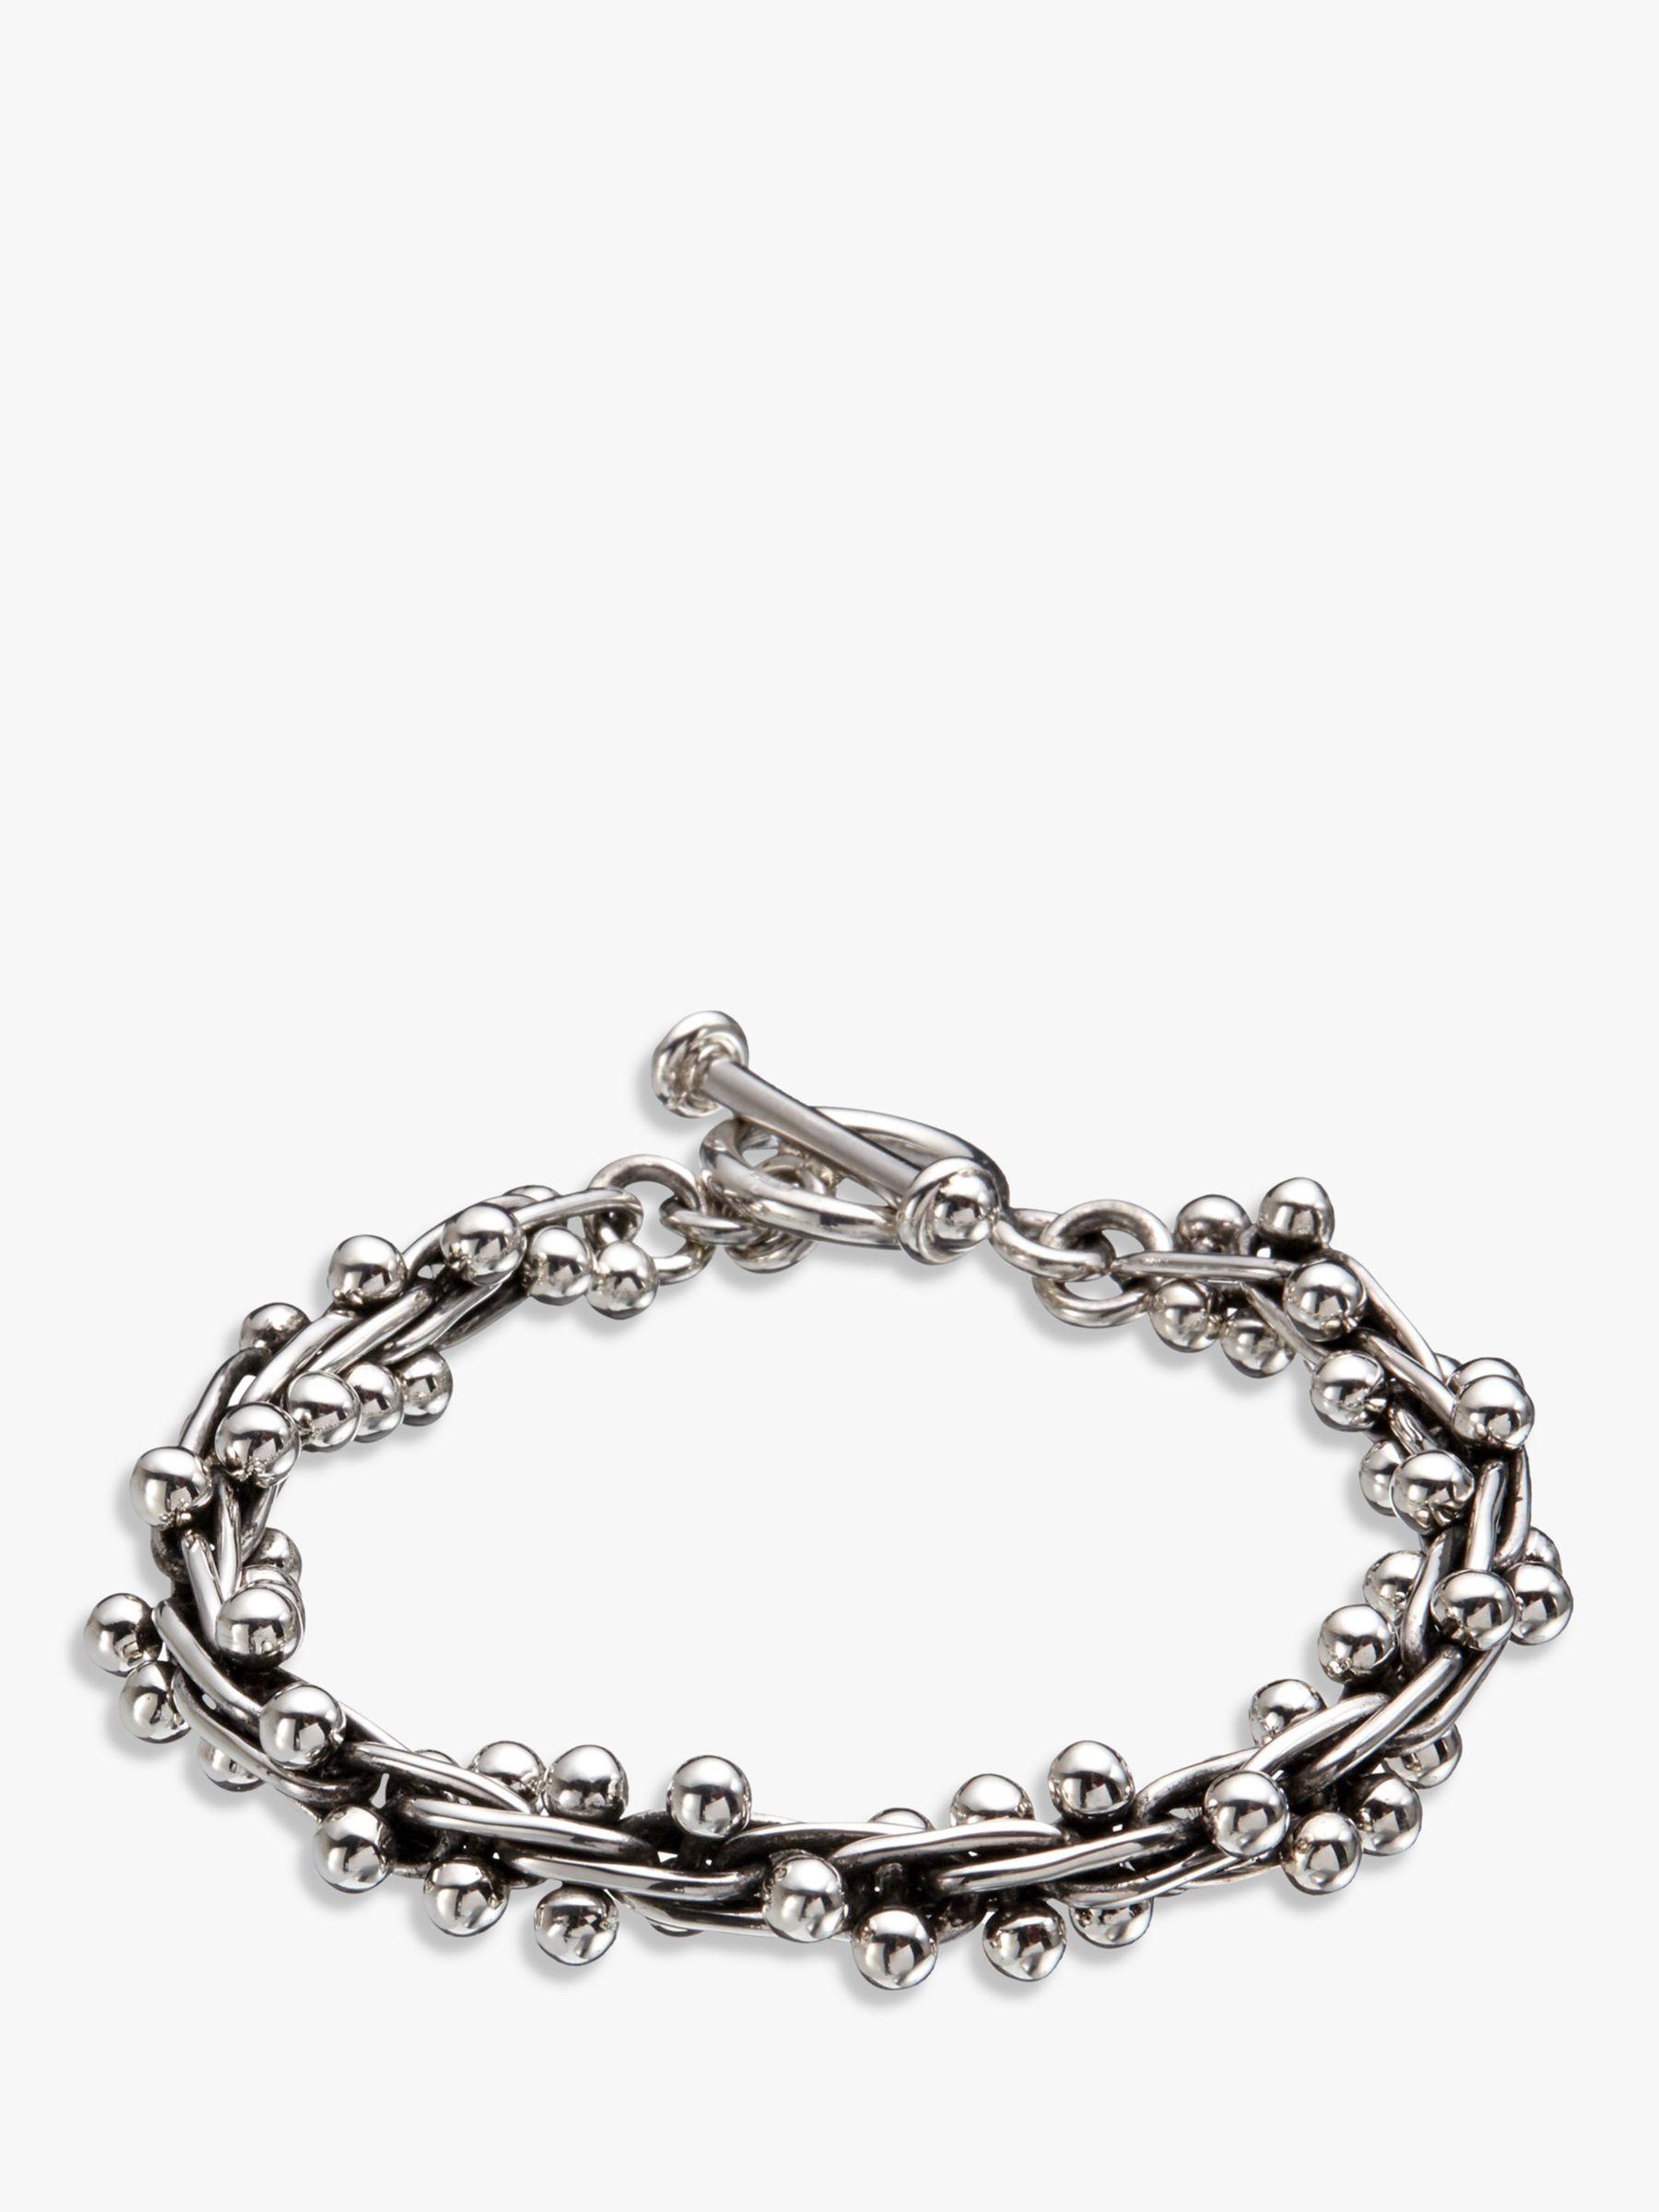 Andea Andea Sterling Silver Beaded Multi-Link Bracelet, Silver